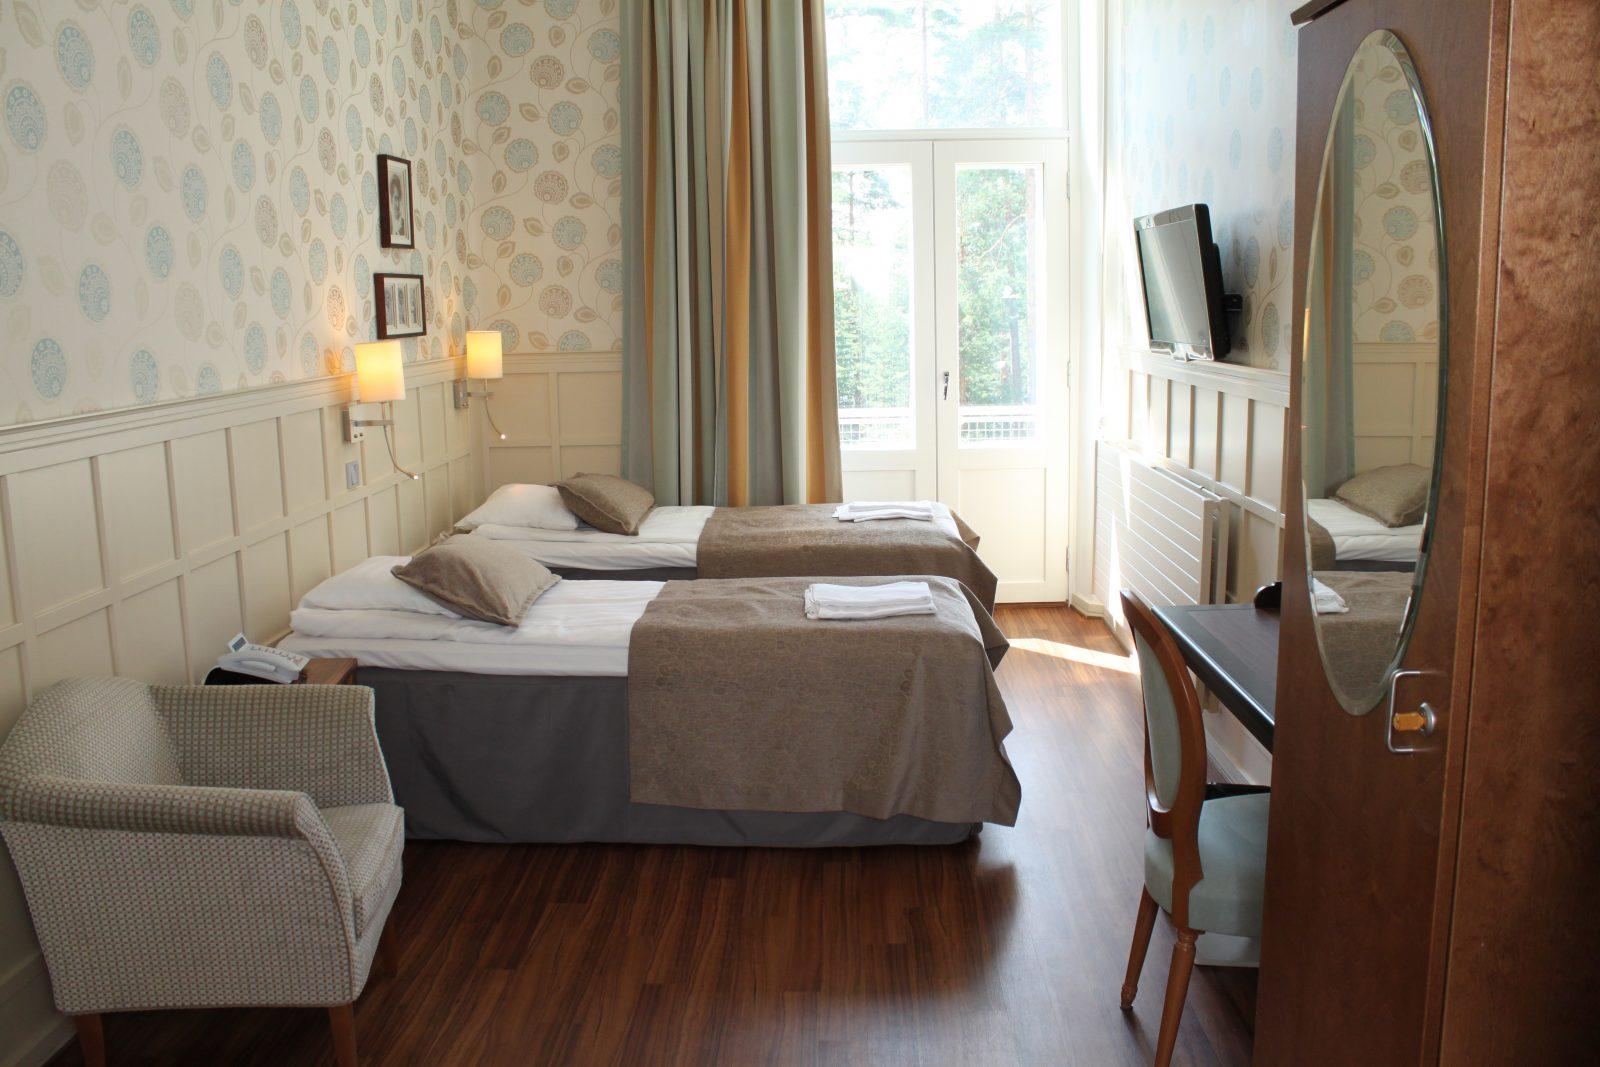 Hotel weekend in Punkaharju from 52 €/person/night